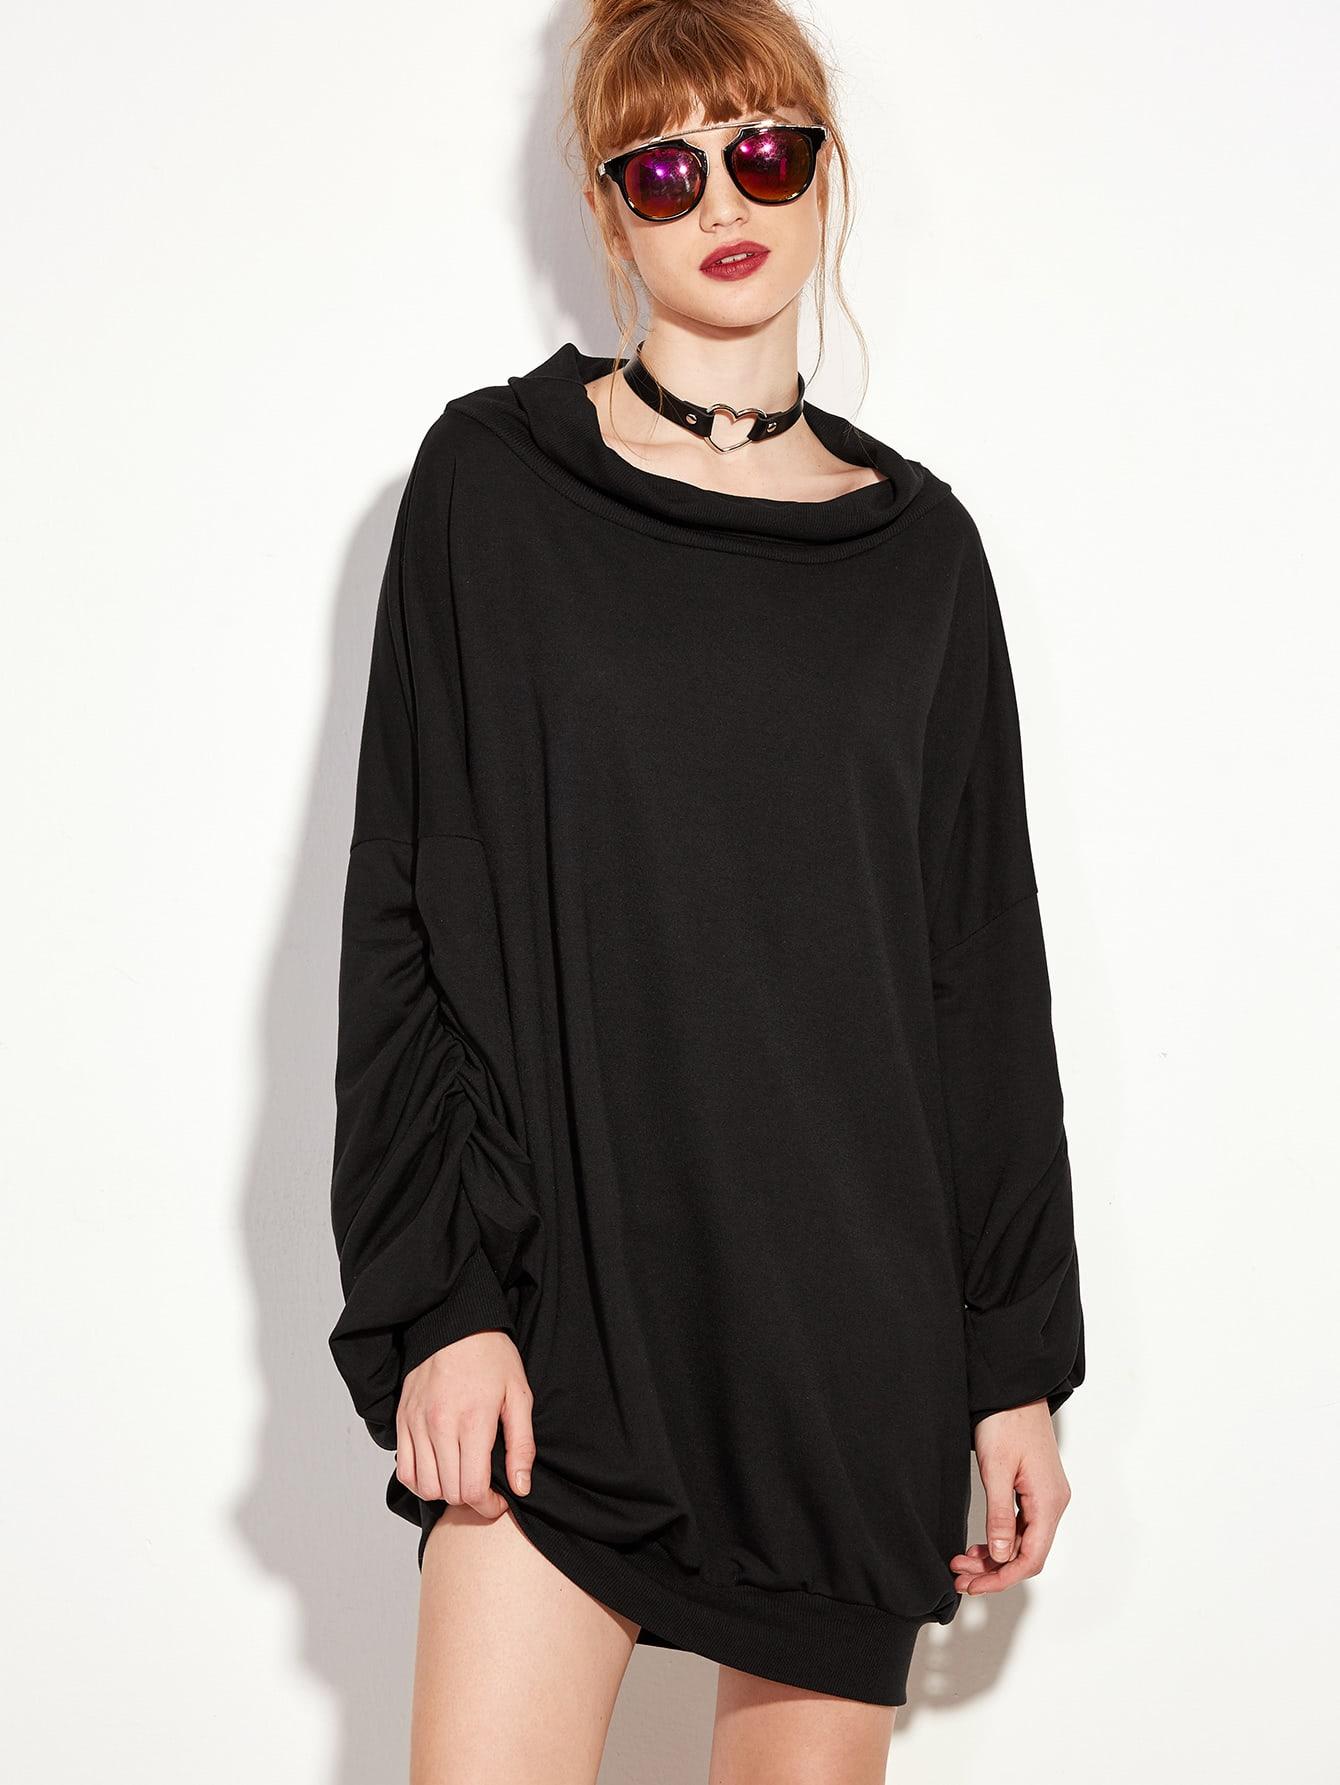 Black Lantern Sleeve Sweatshirt DressBlack Lantern Sleeve Sweatshirt Dress<br><br>color: Black<br>size: L,M,S,XL